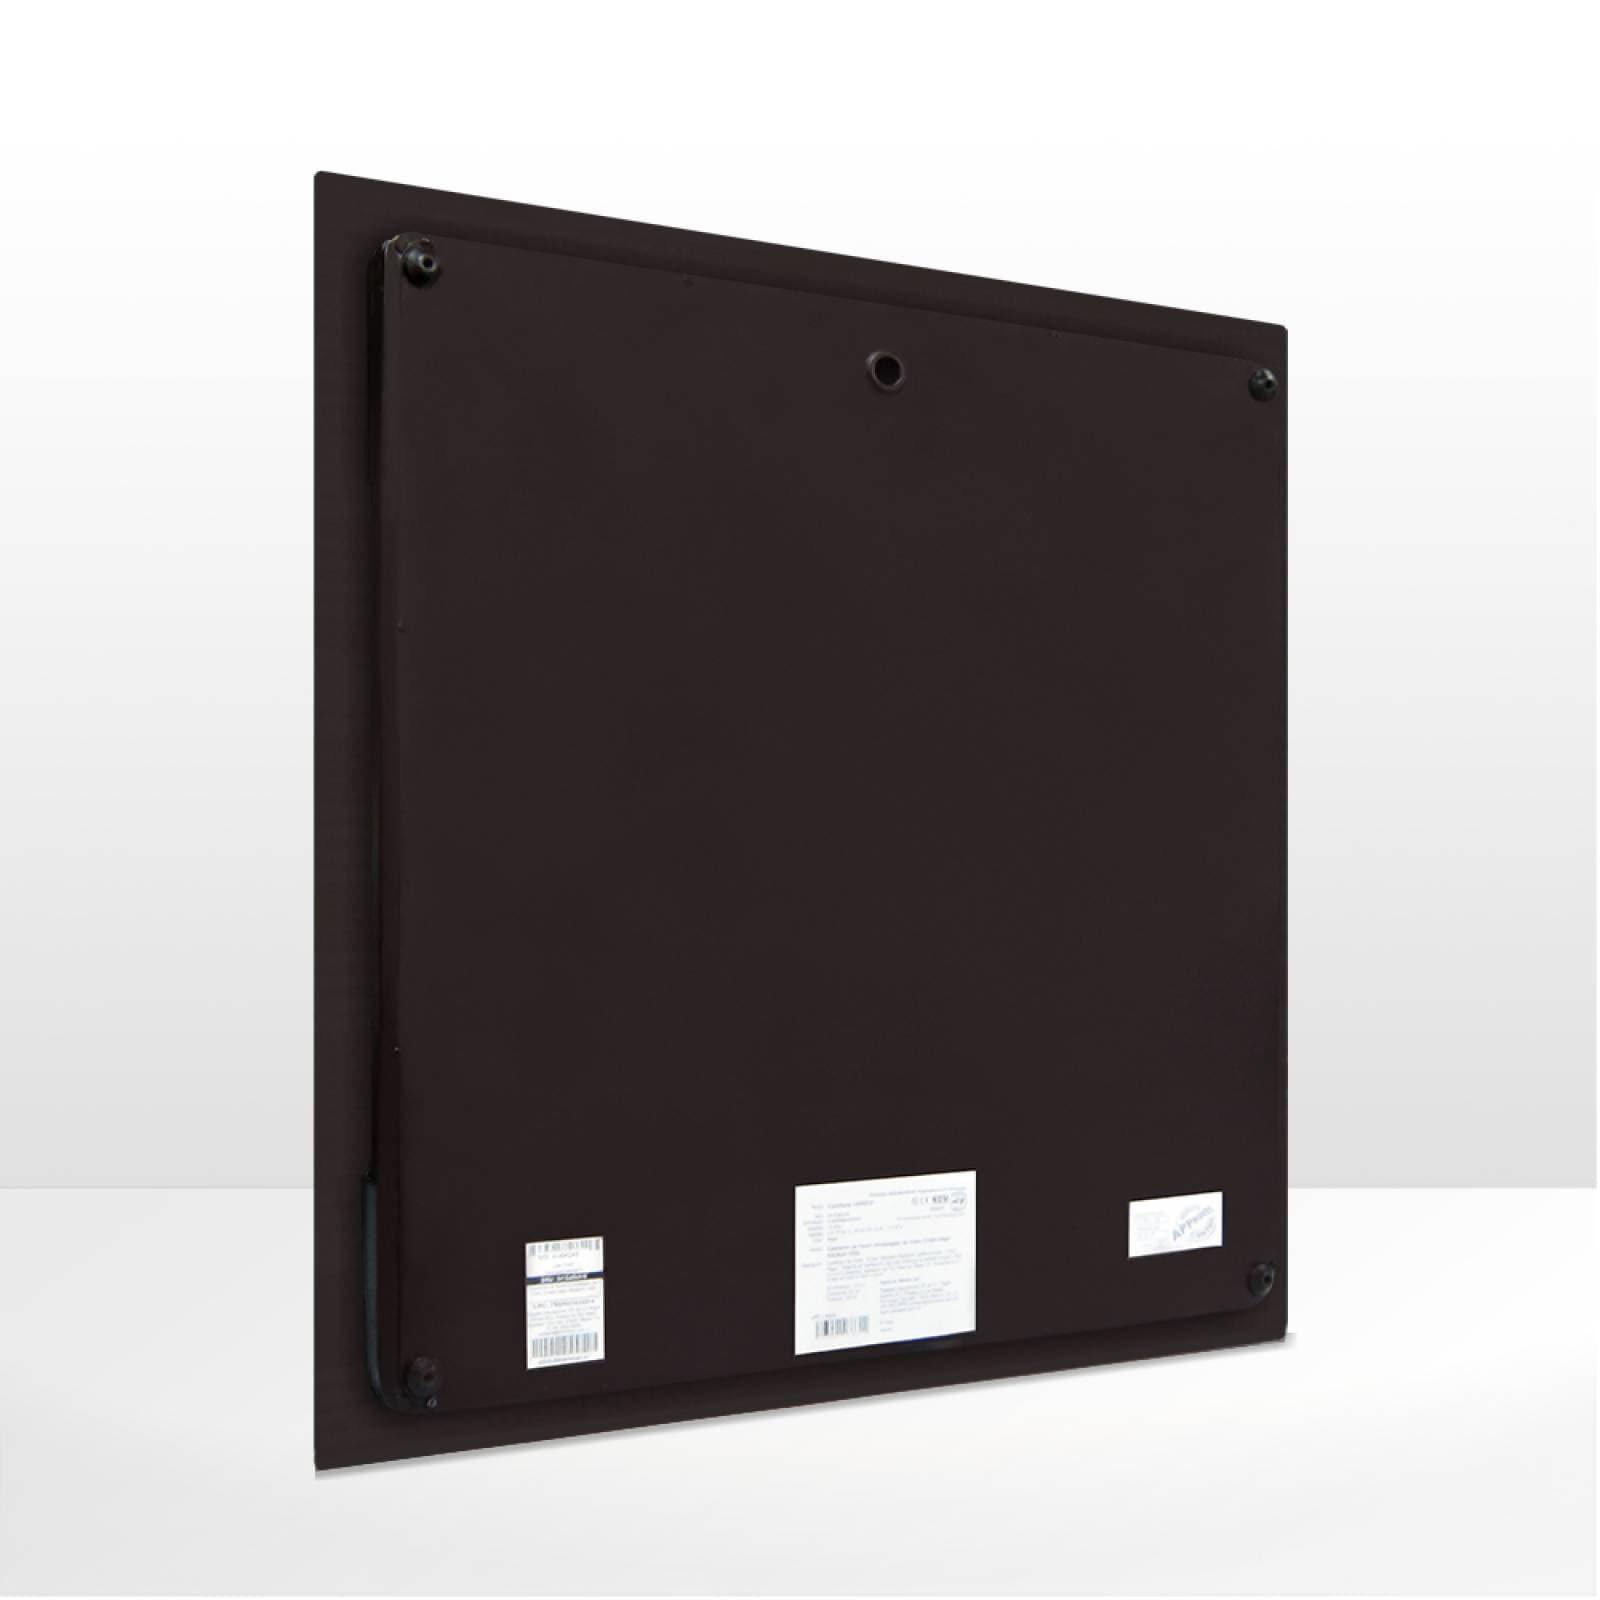 Paquete de 5 Calefactores de Panel de Porcelanato River 380w, Compra 4 Llevate 5, Mod: 333CaSol5x4